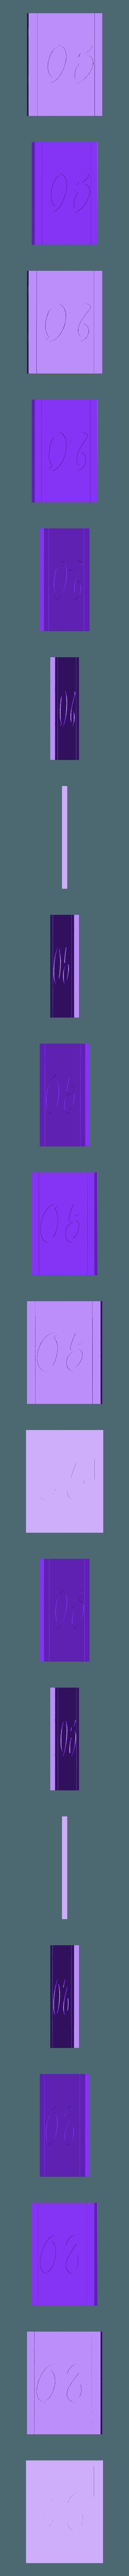 5_-_20.stl Download free SCAD file Perpetual Flip Calendar (W/ Customizable Font) • 3D printable model, Dsk